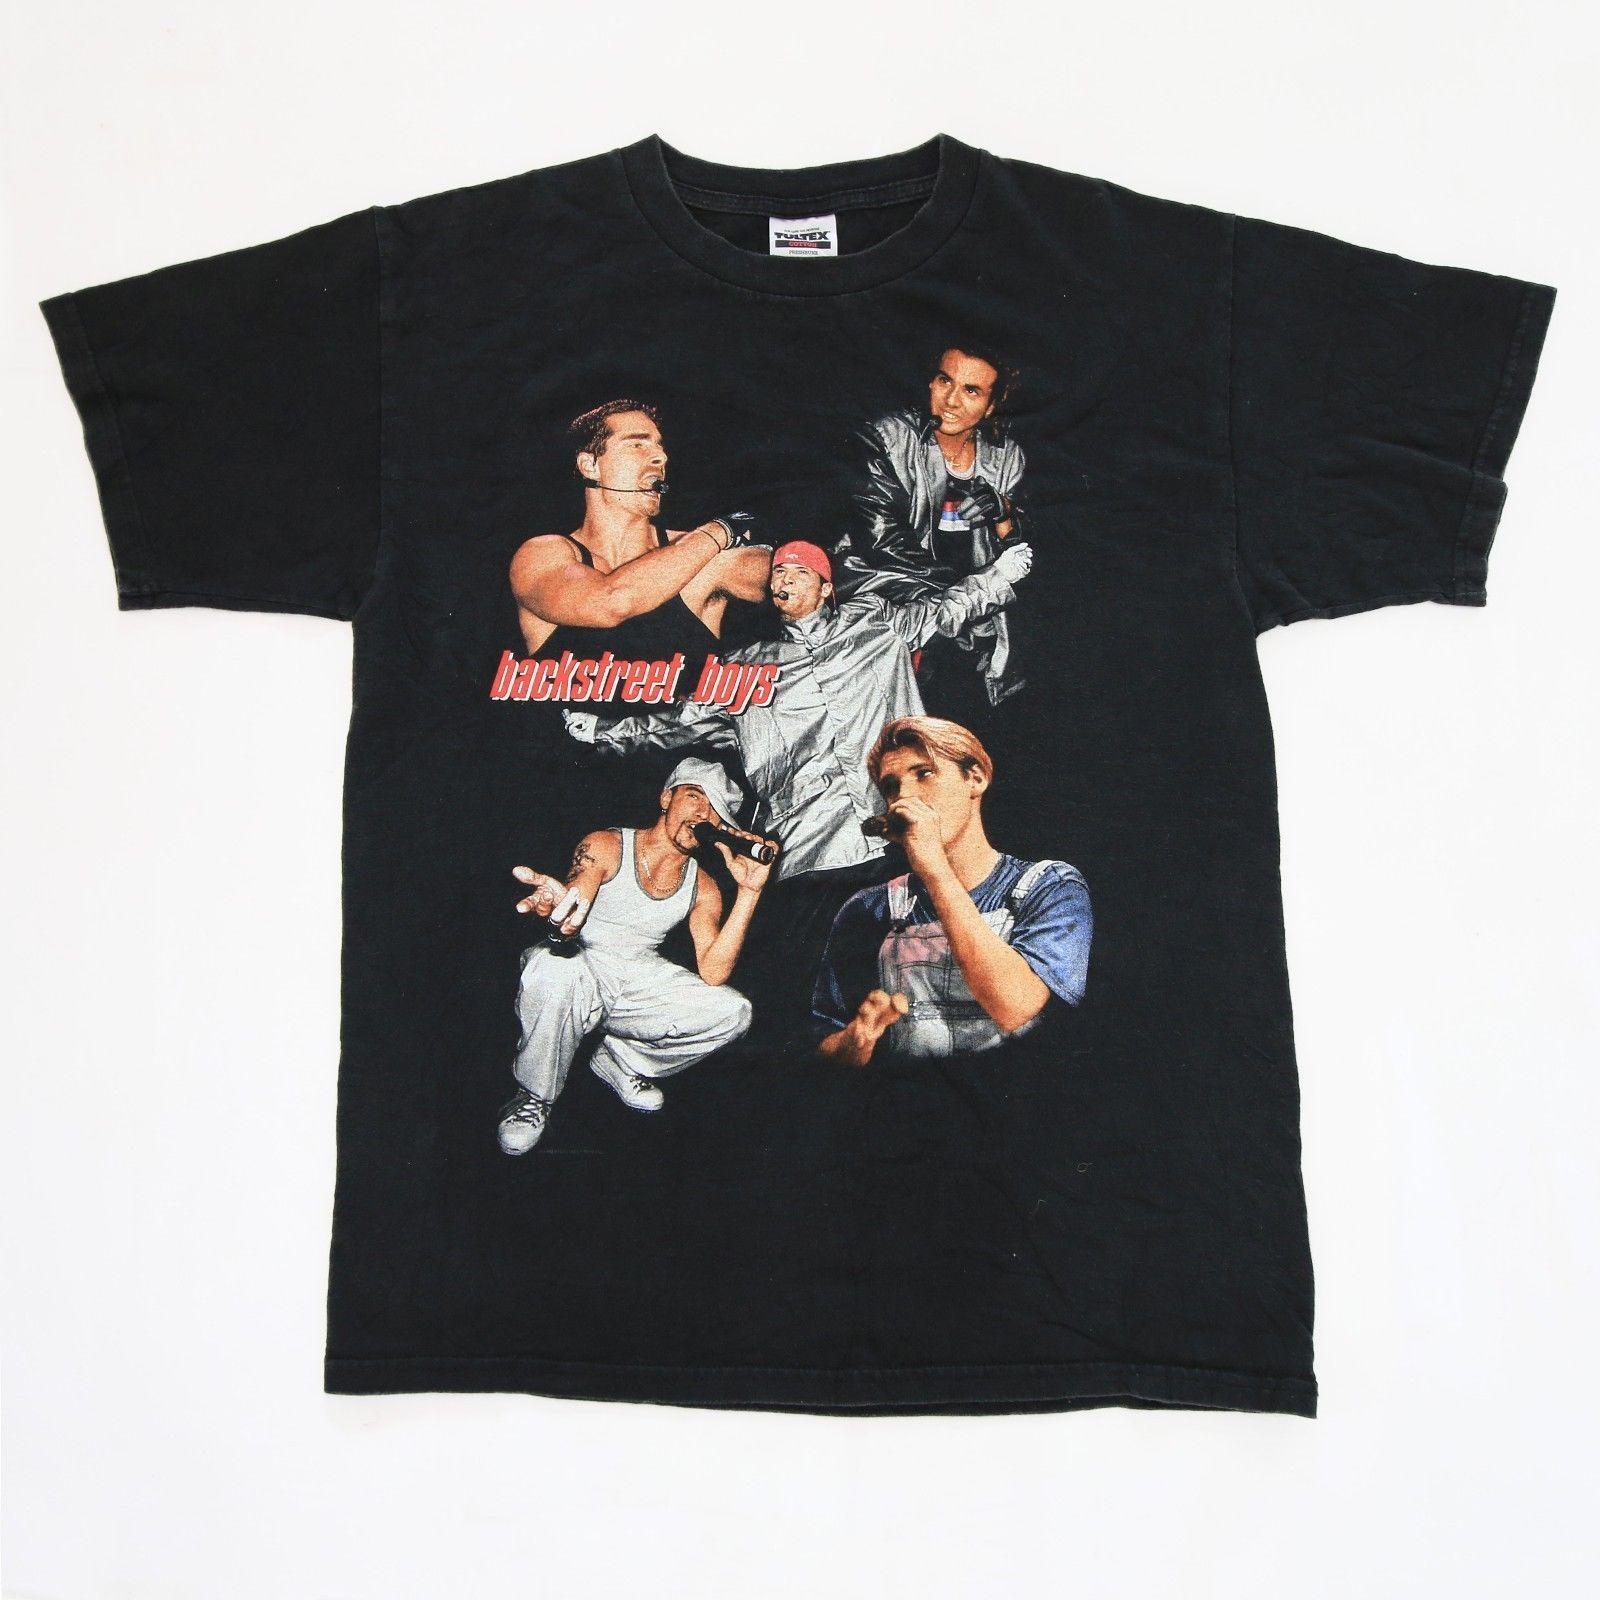 Vtg 90s Backstreet Boys 1998 Backstreets Back T Shirt Nsync Nkotb